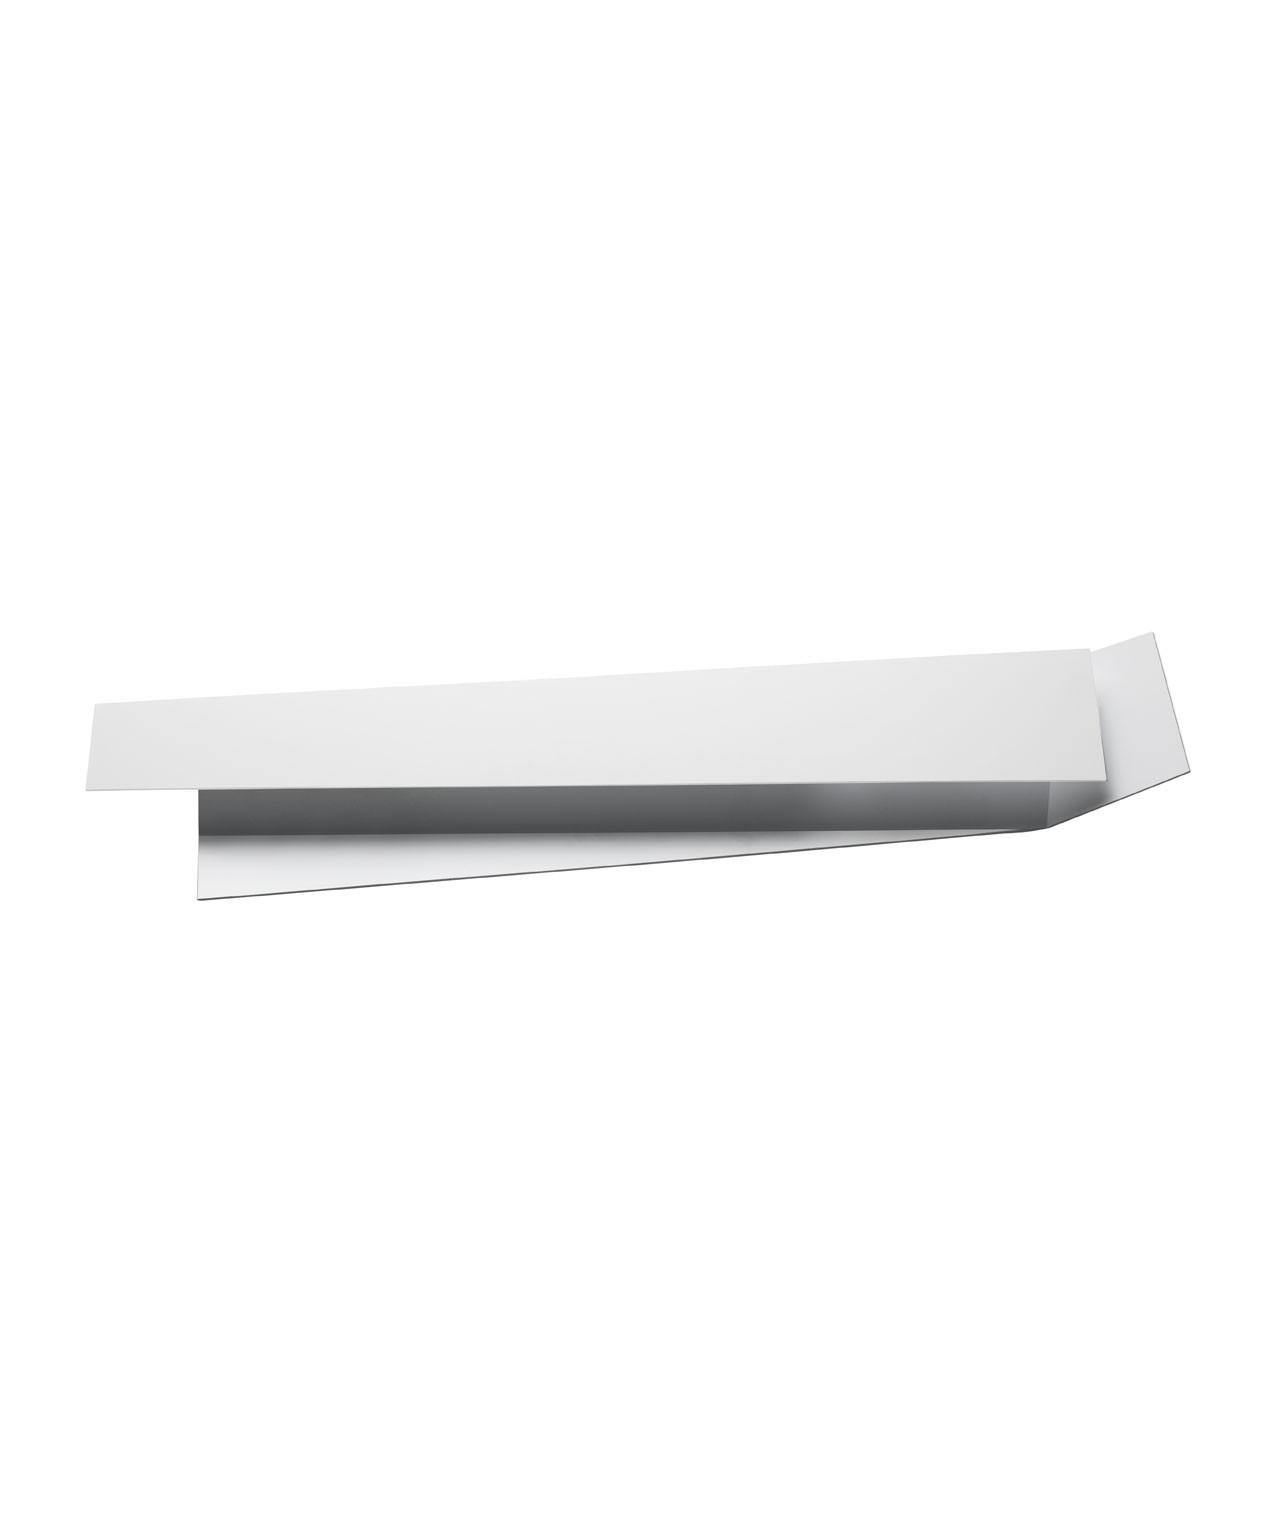 Image of   Flap 3 Væglampe Hvid - Foscarini